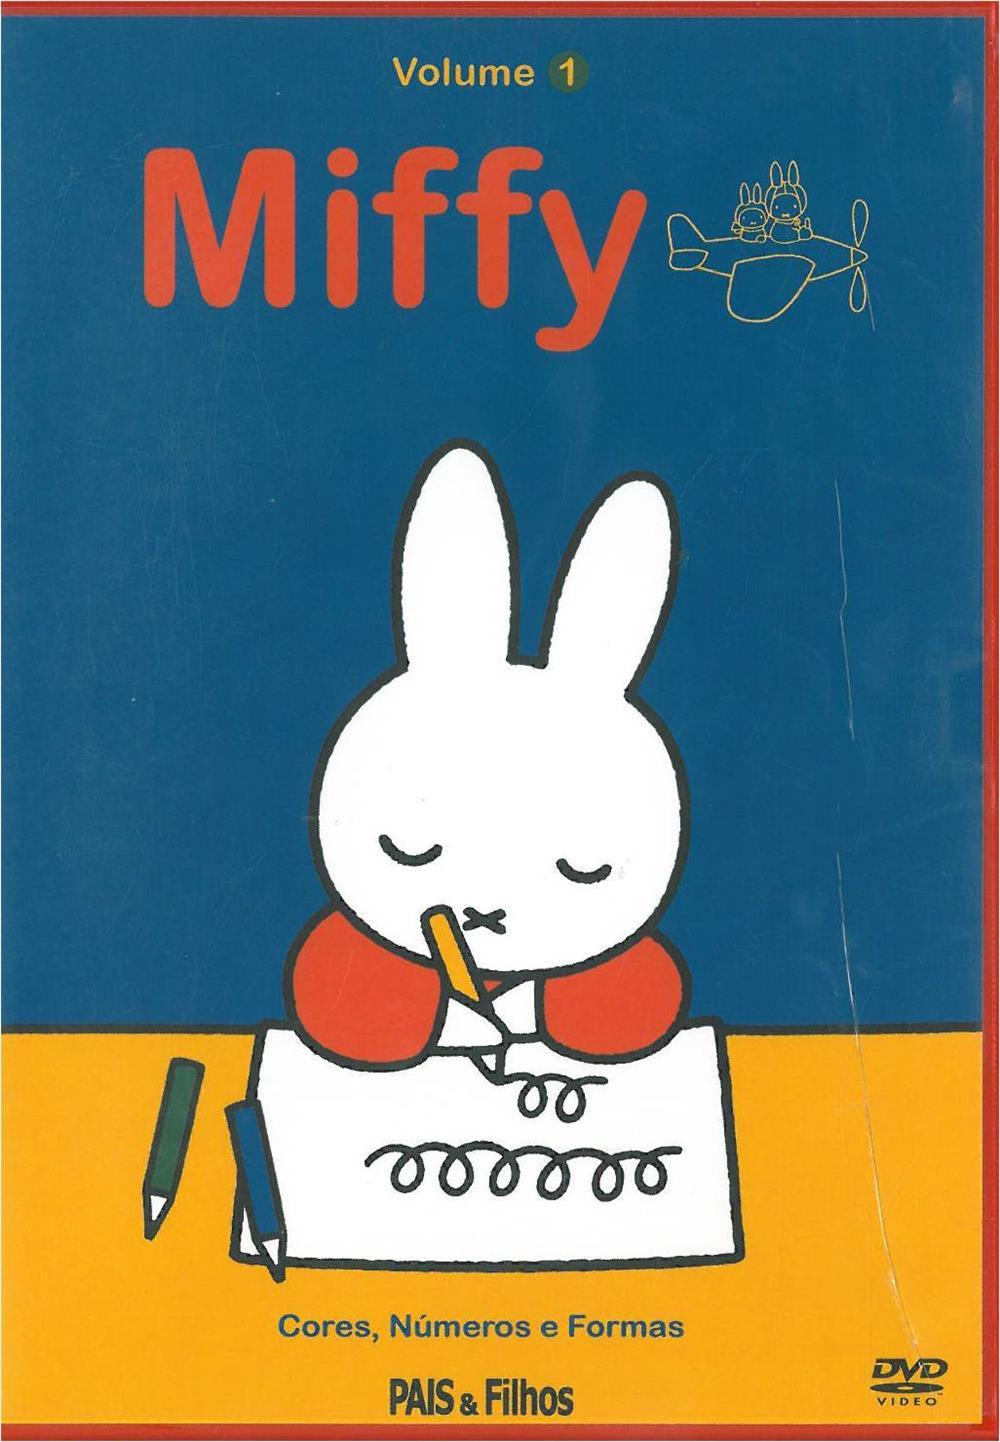 Miffy_cores, números e formas_DVD.jpg